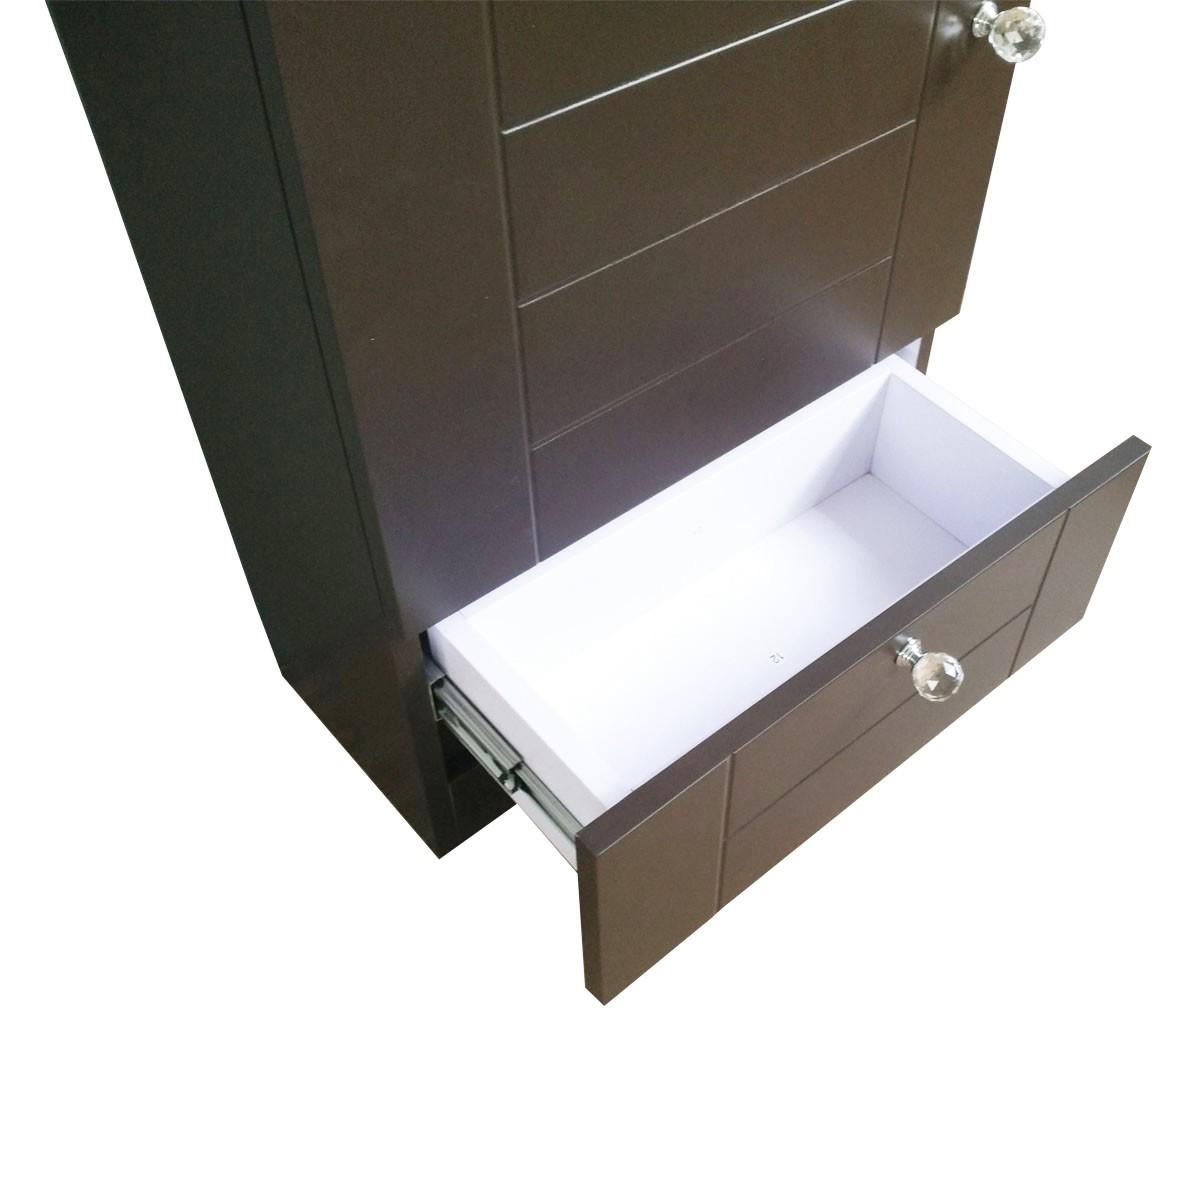 Renovators Supply Bathroom Vanity Cabinet Sink with Faucet and Drain Combo Modern Sleek Small Space Saving Dark Oak Brown Bathroom Cabinet Vanity Mounted Sink Modern Cabinet Vanity Sink With Drawers